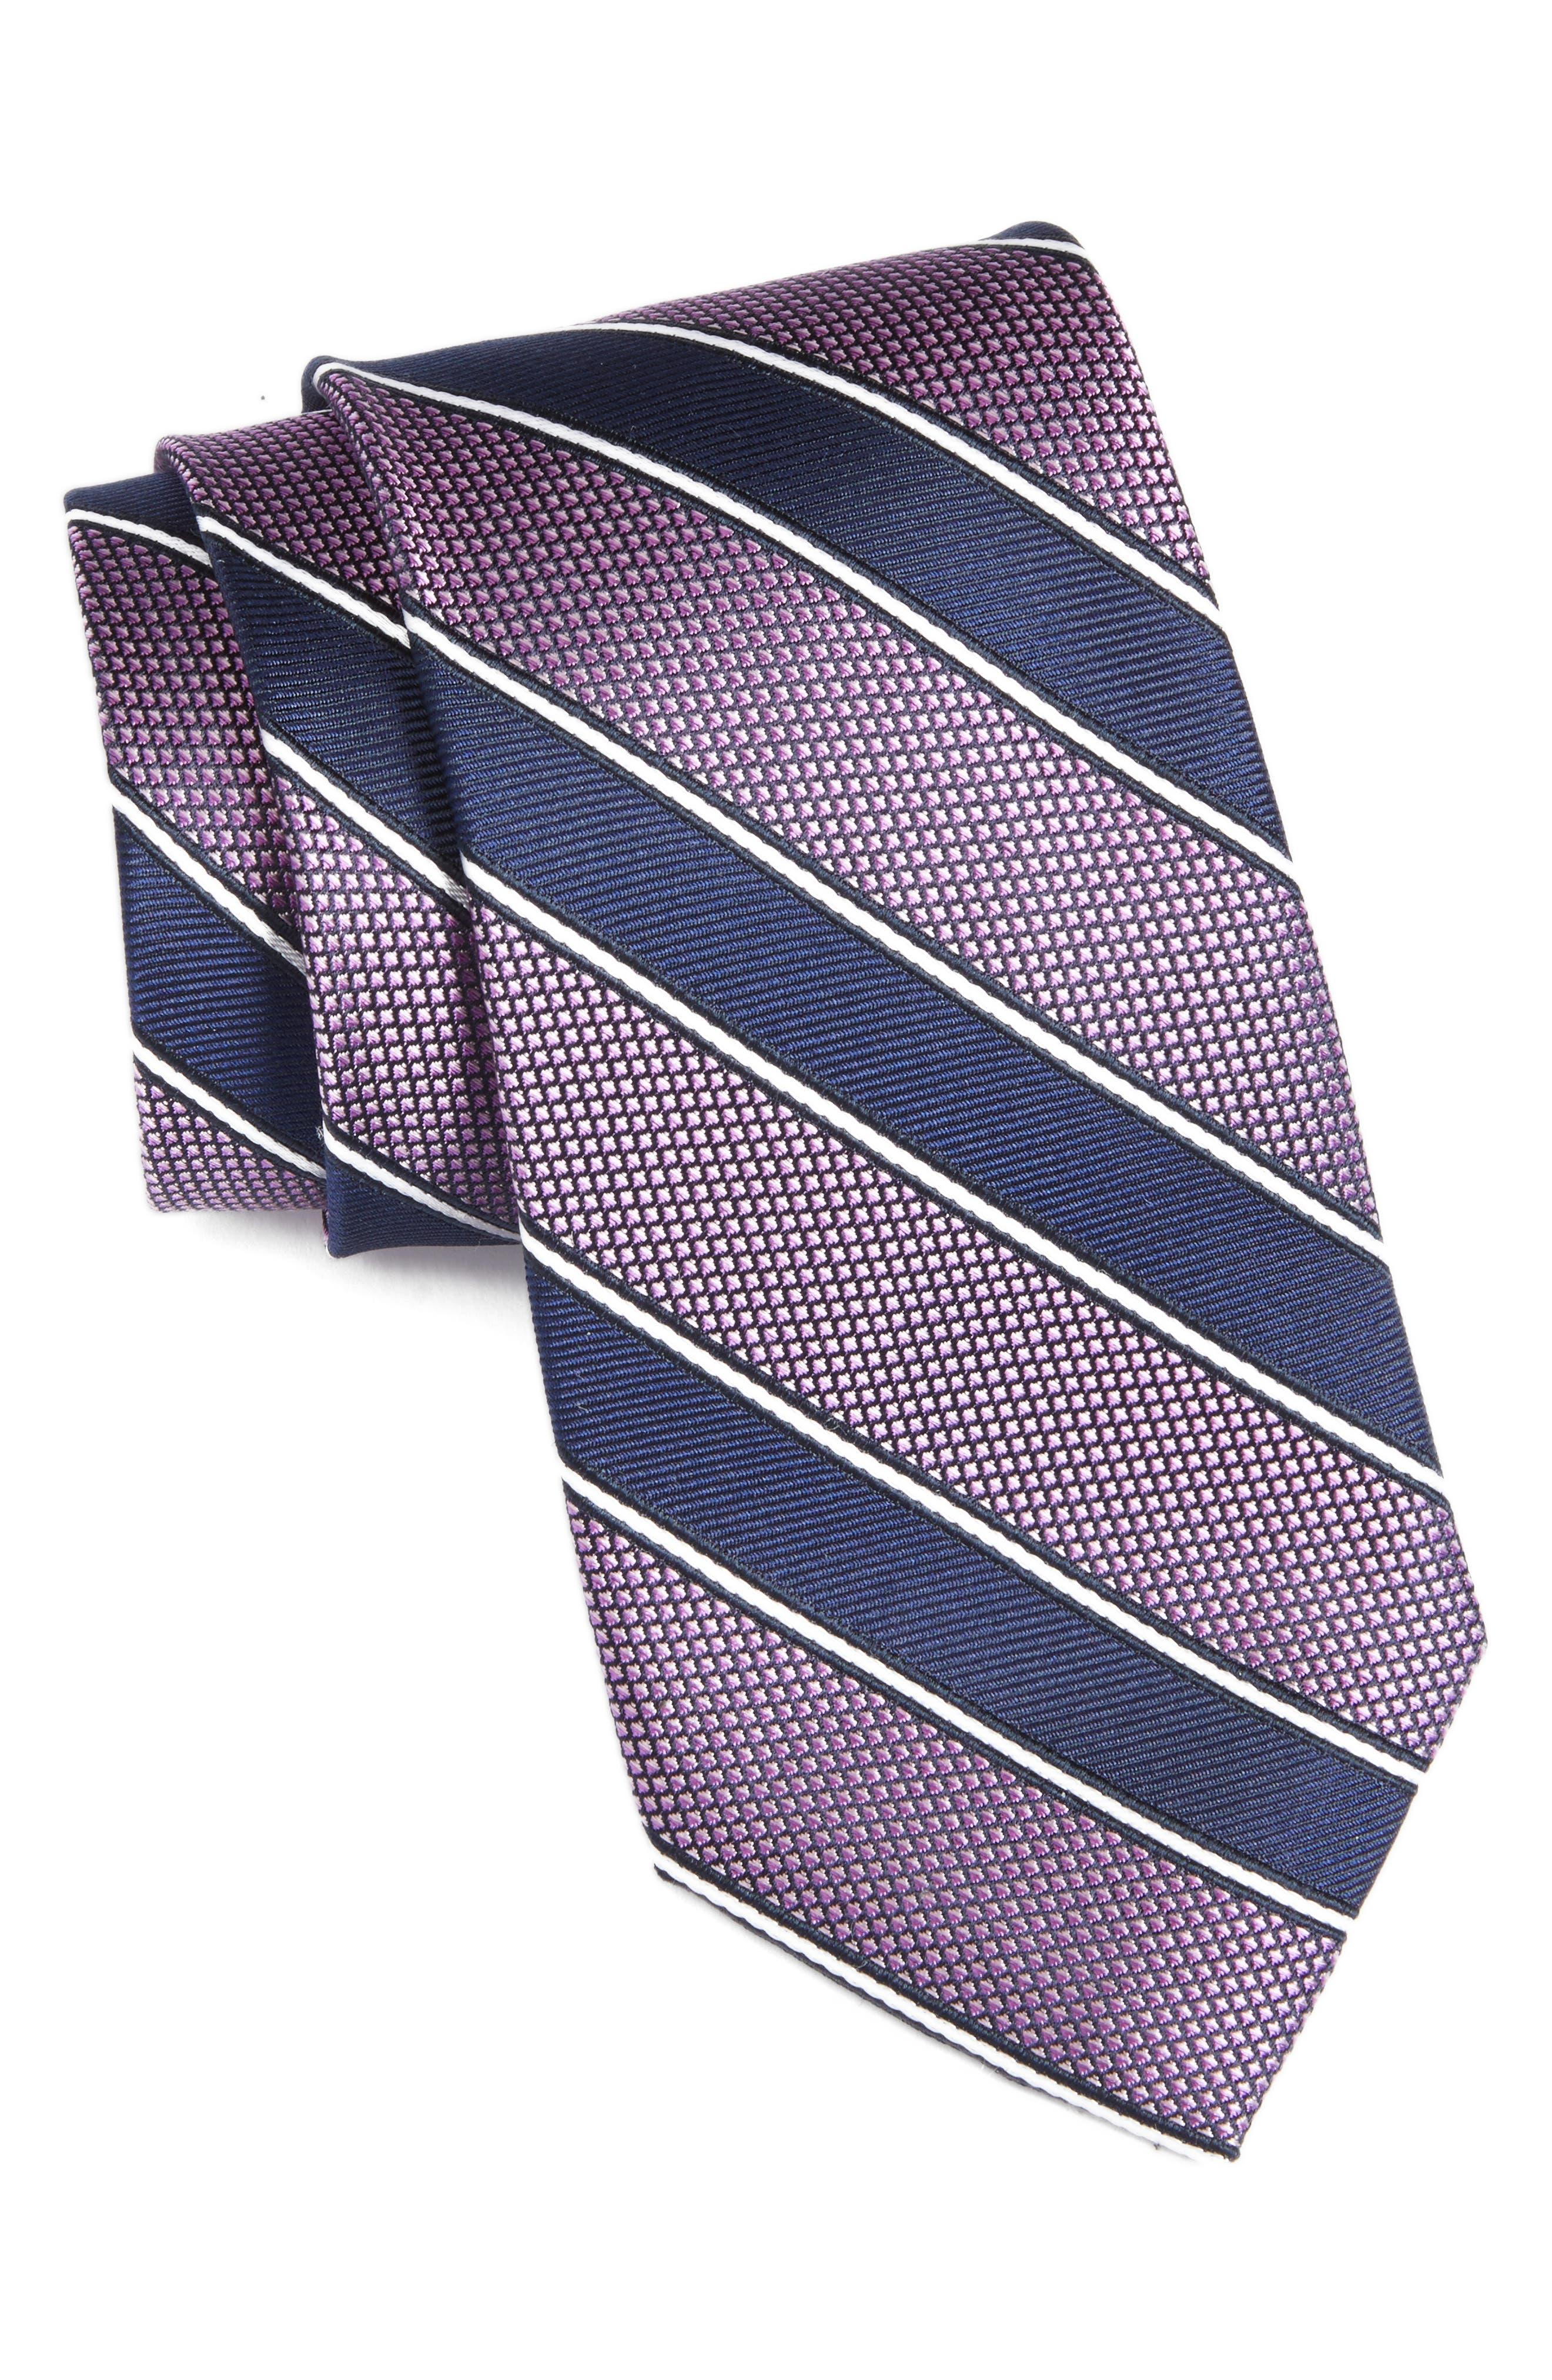 Alternate Image 1 Selected - Nordstrom Men's Shop Copio Stripe Silk Tie